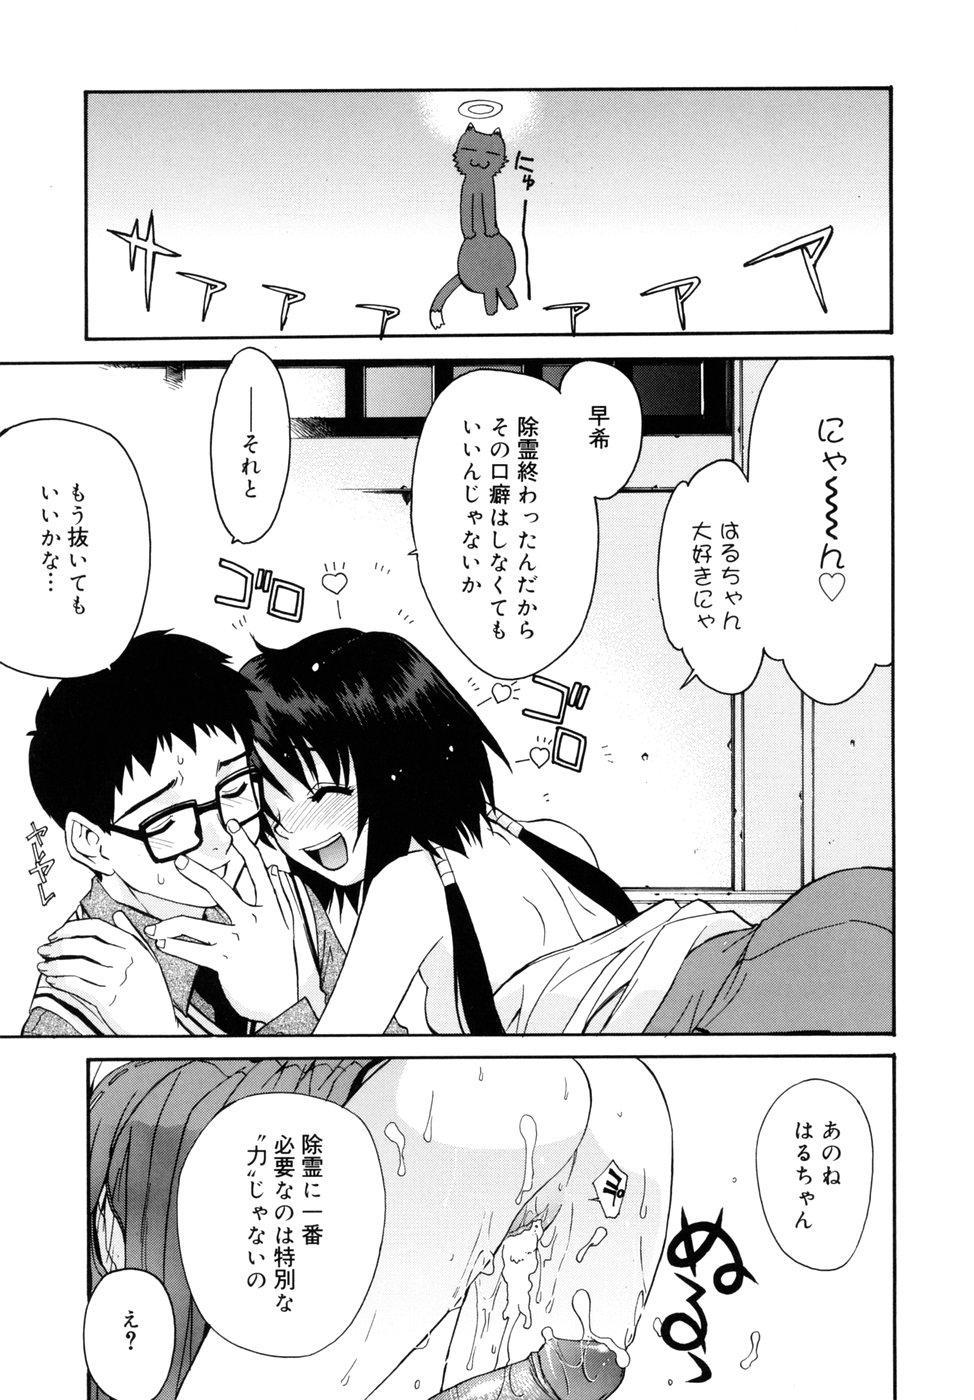 [Yaya Hinata] Tonari no Miko-san wa Minna Warau - The next shrine maidens smile in everyone. 20